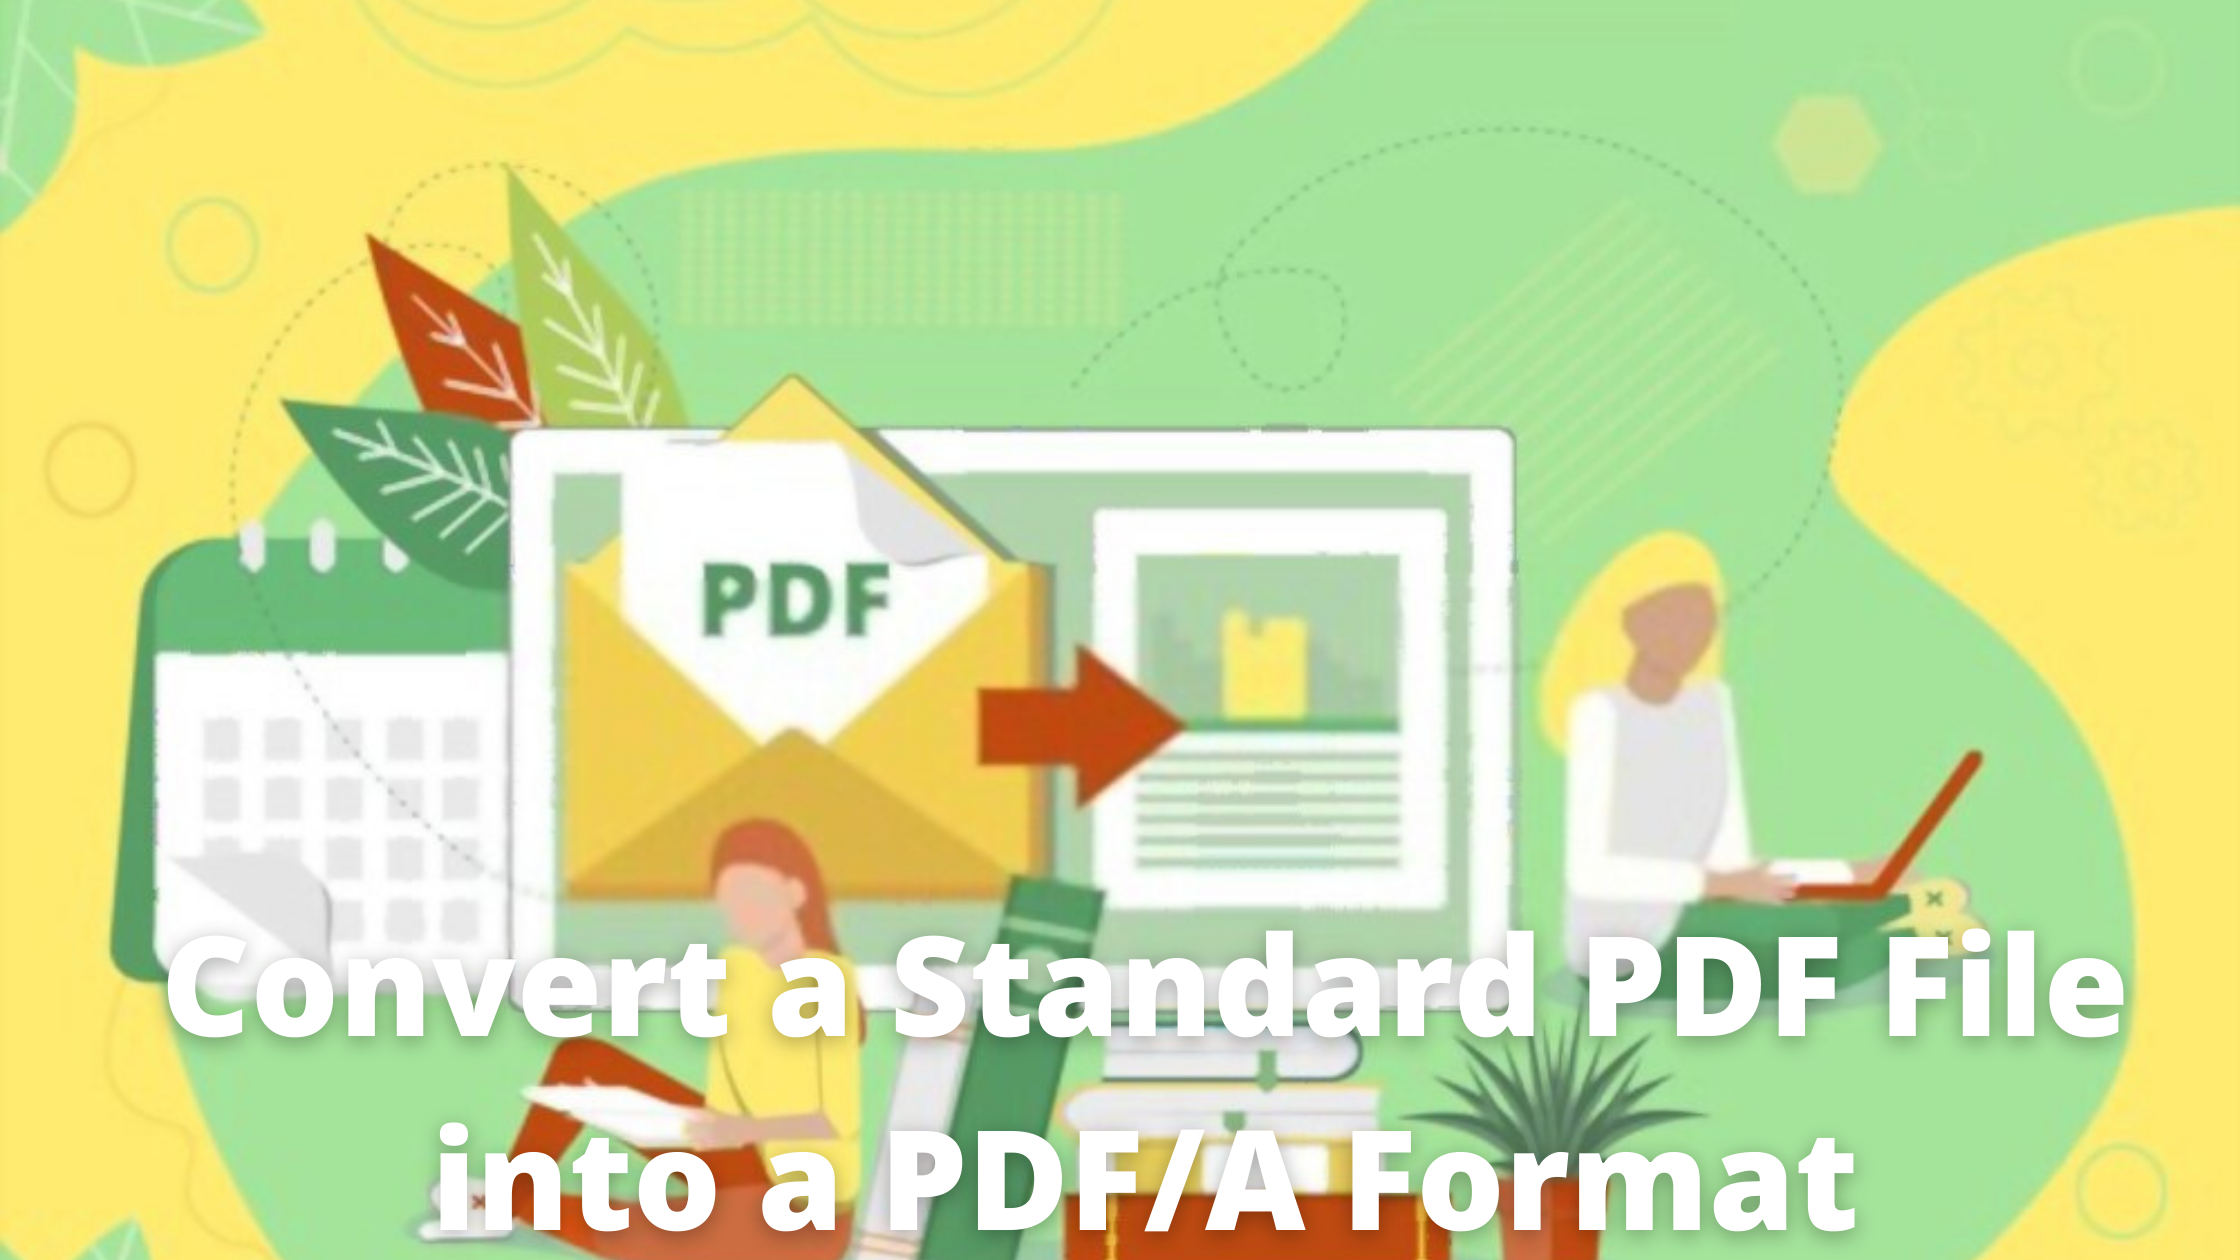 Convert a Standard PDF File into a PDF_A Format